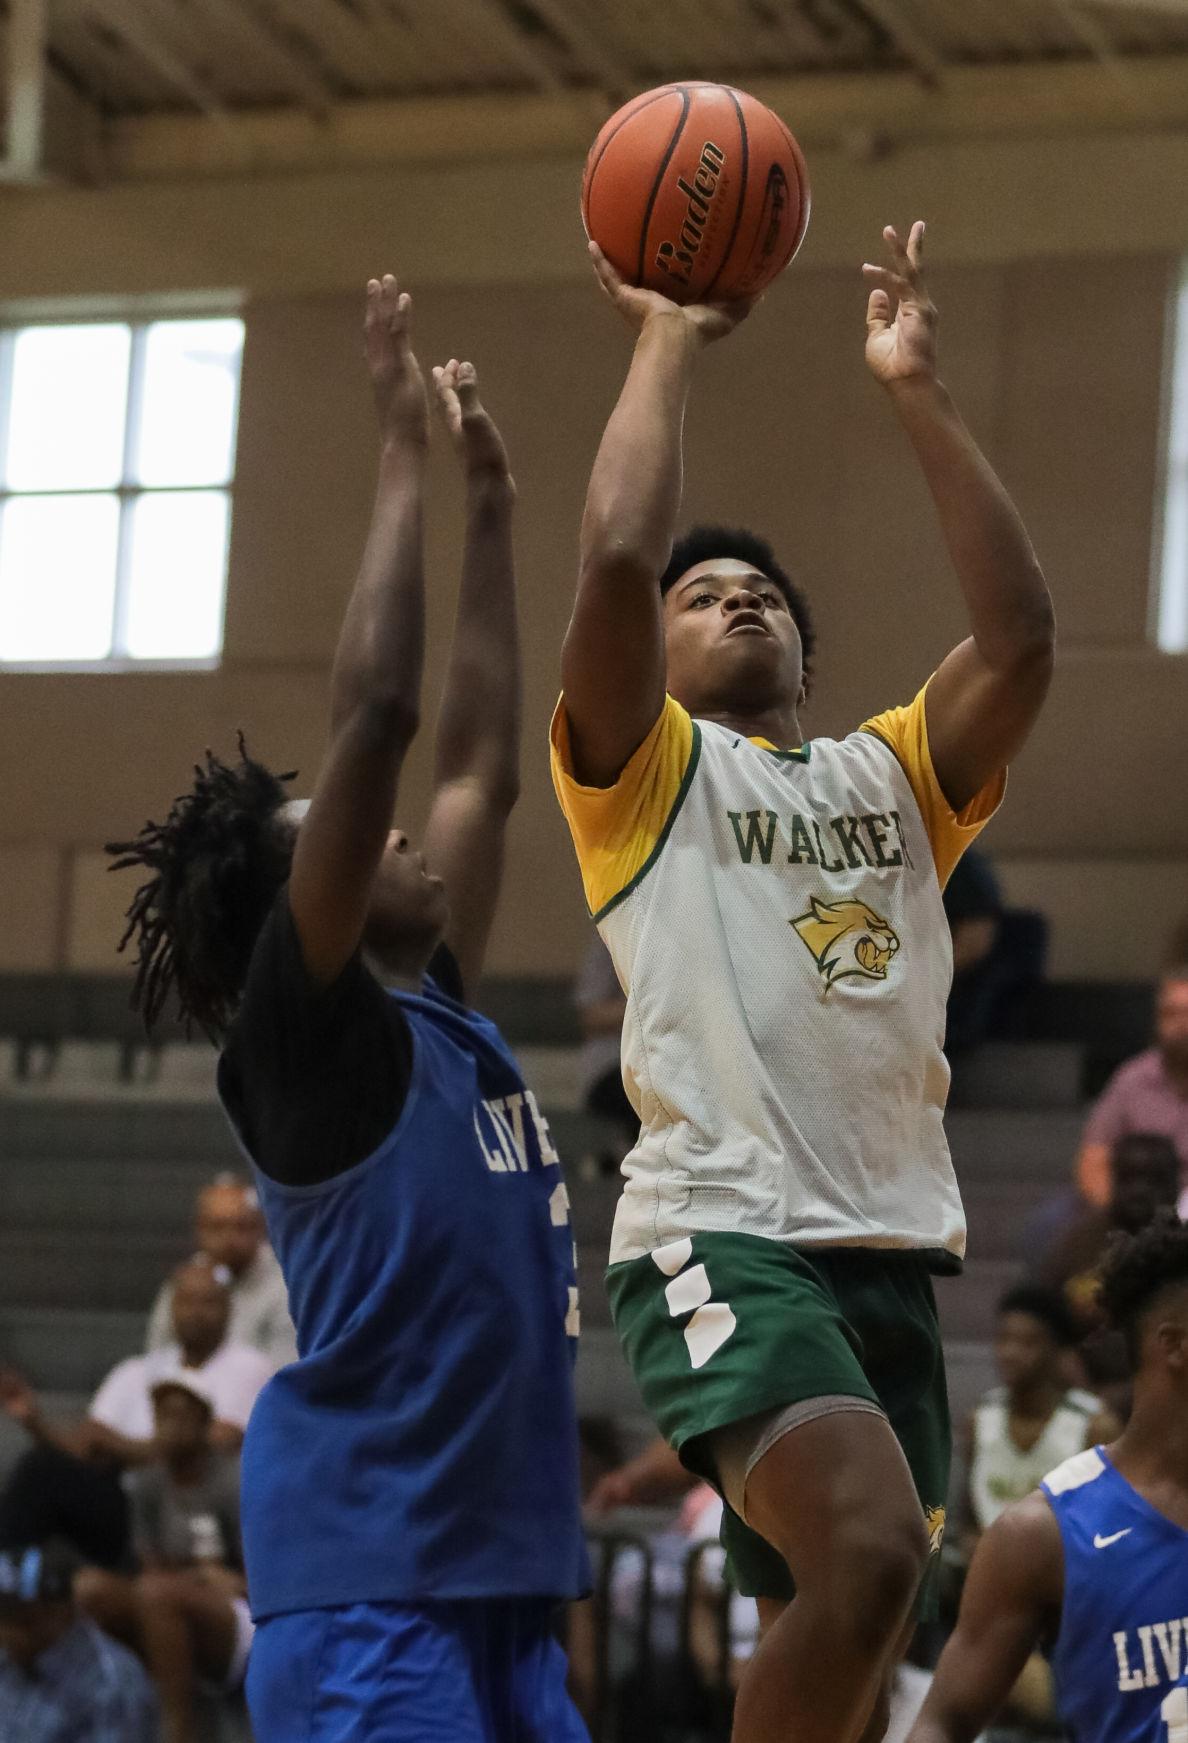 Walker vs. Live Oak basketball Jalen Cook Darian Ricard